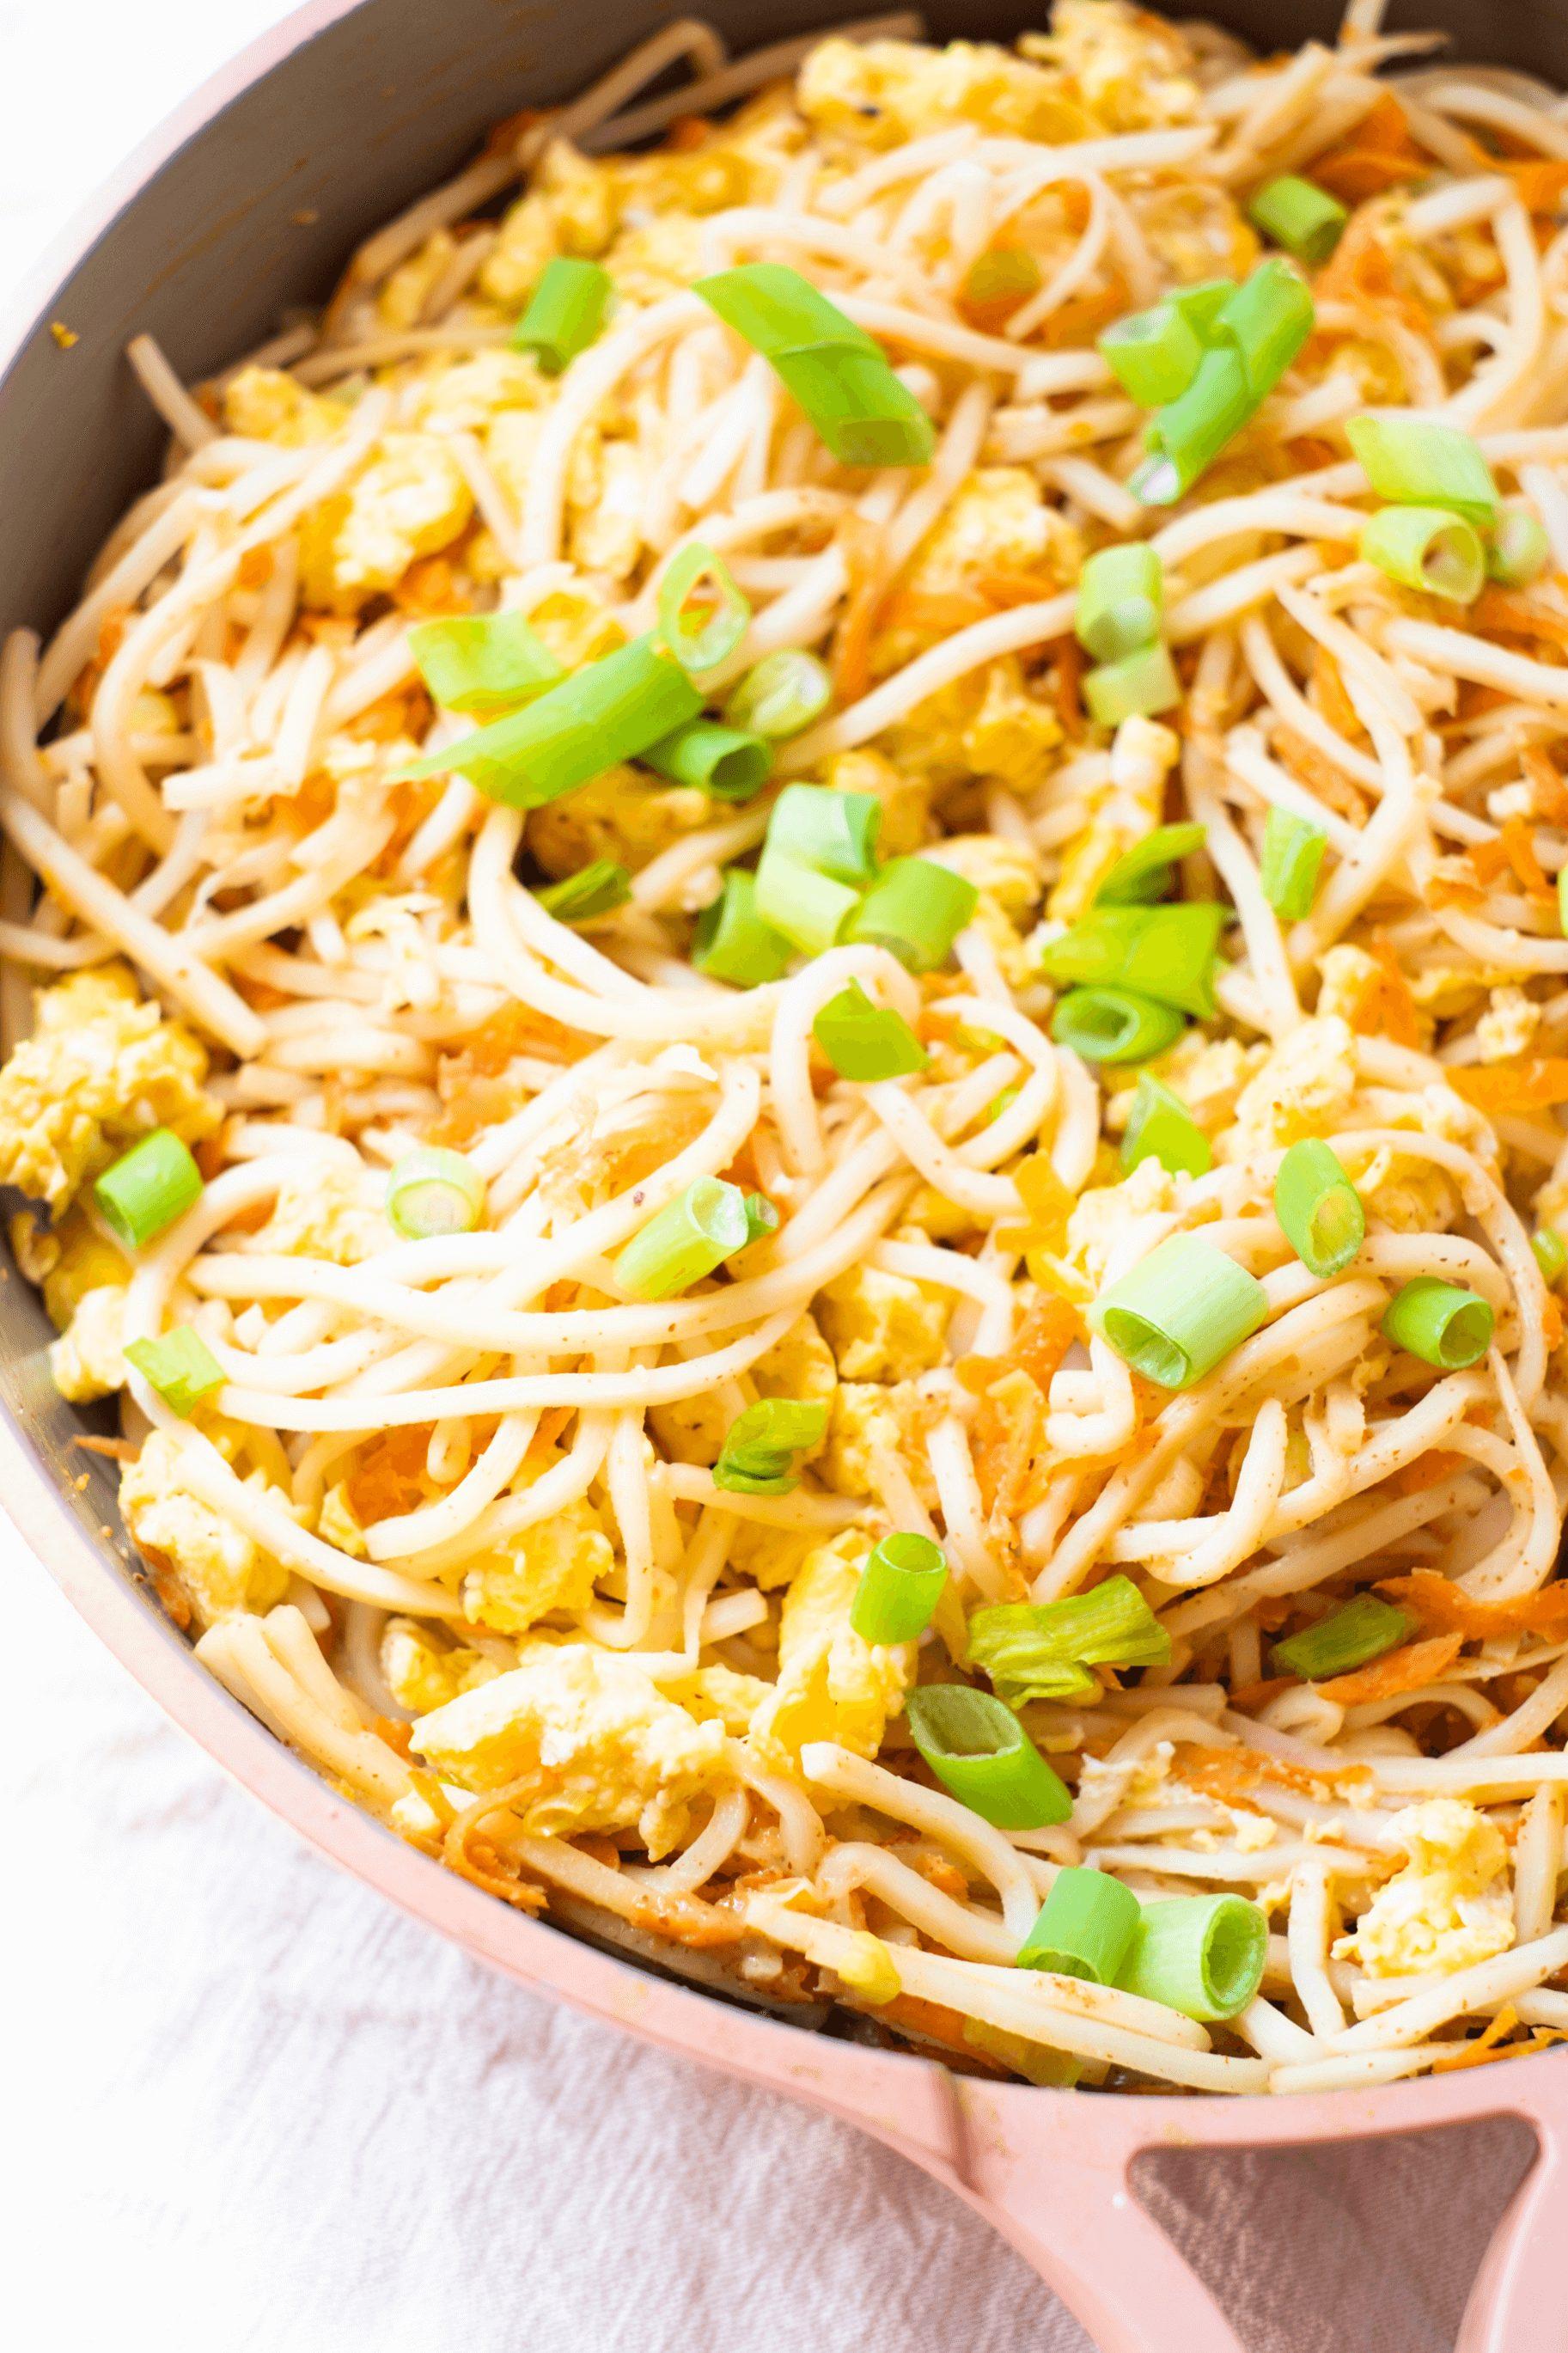 Paleo Pad Thai Recipe #whatsavvysaid #paleopadthai #glutenfreepadthai #padthairecipe #palmini